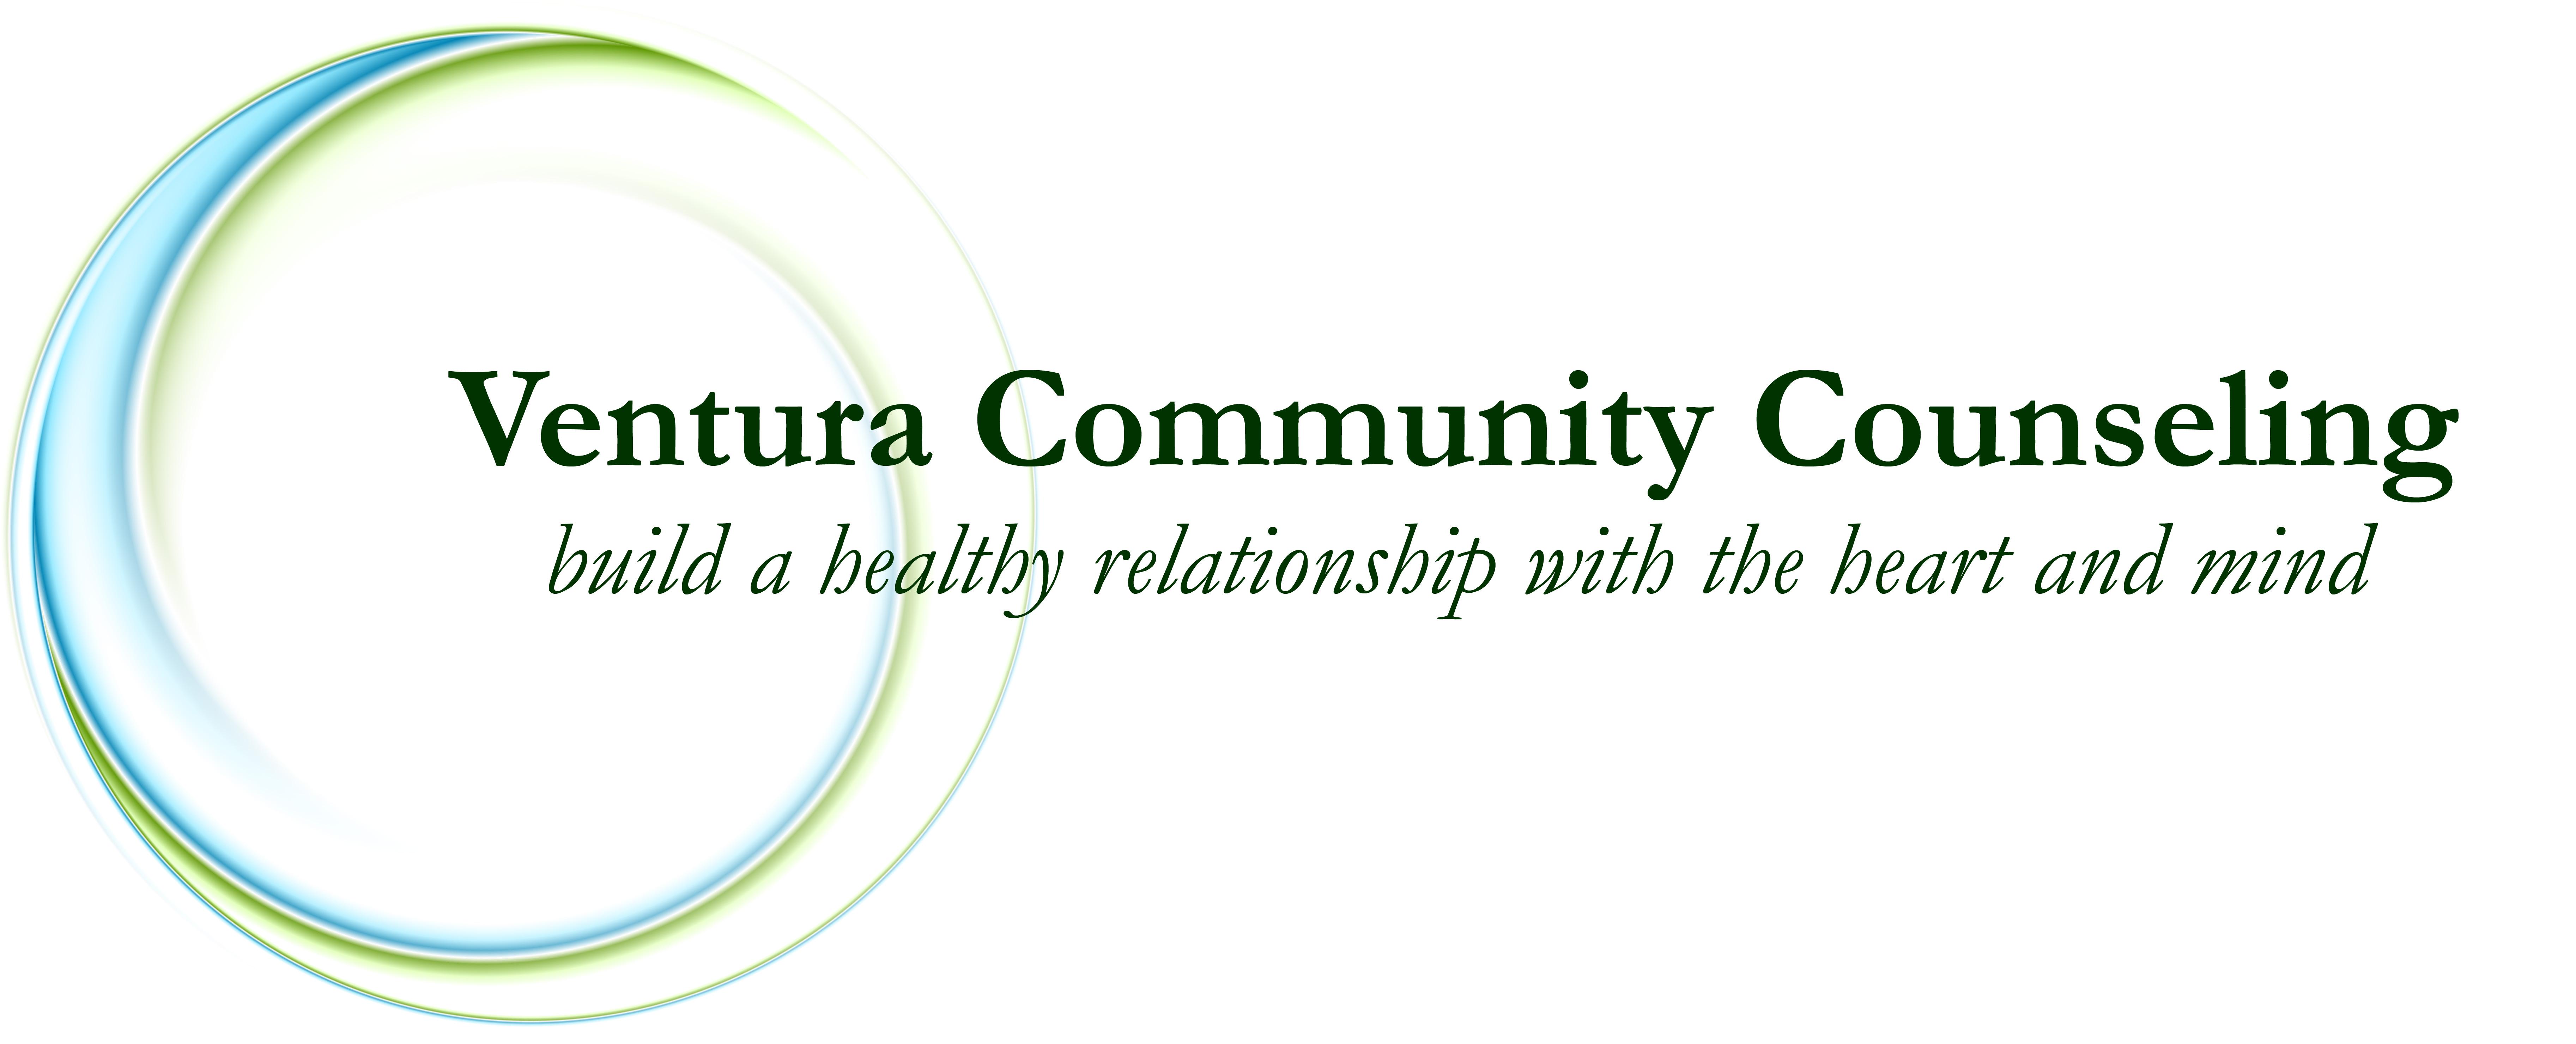 Ventura Community Counseling